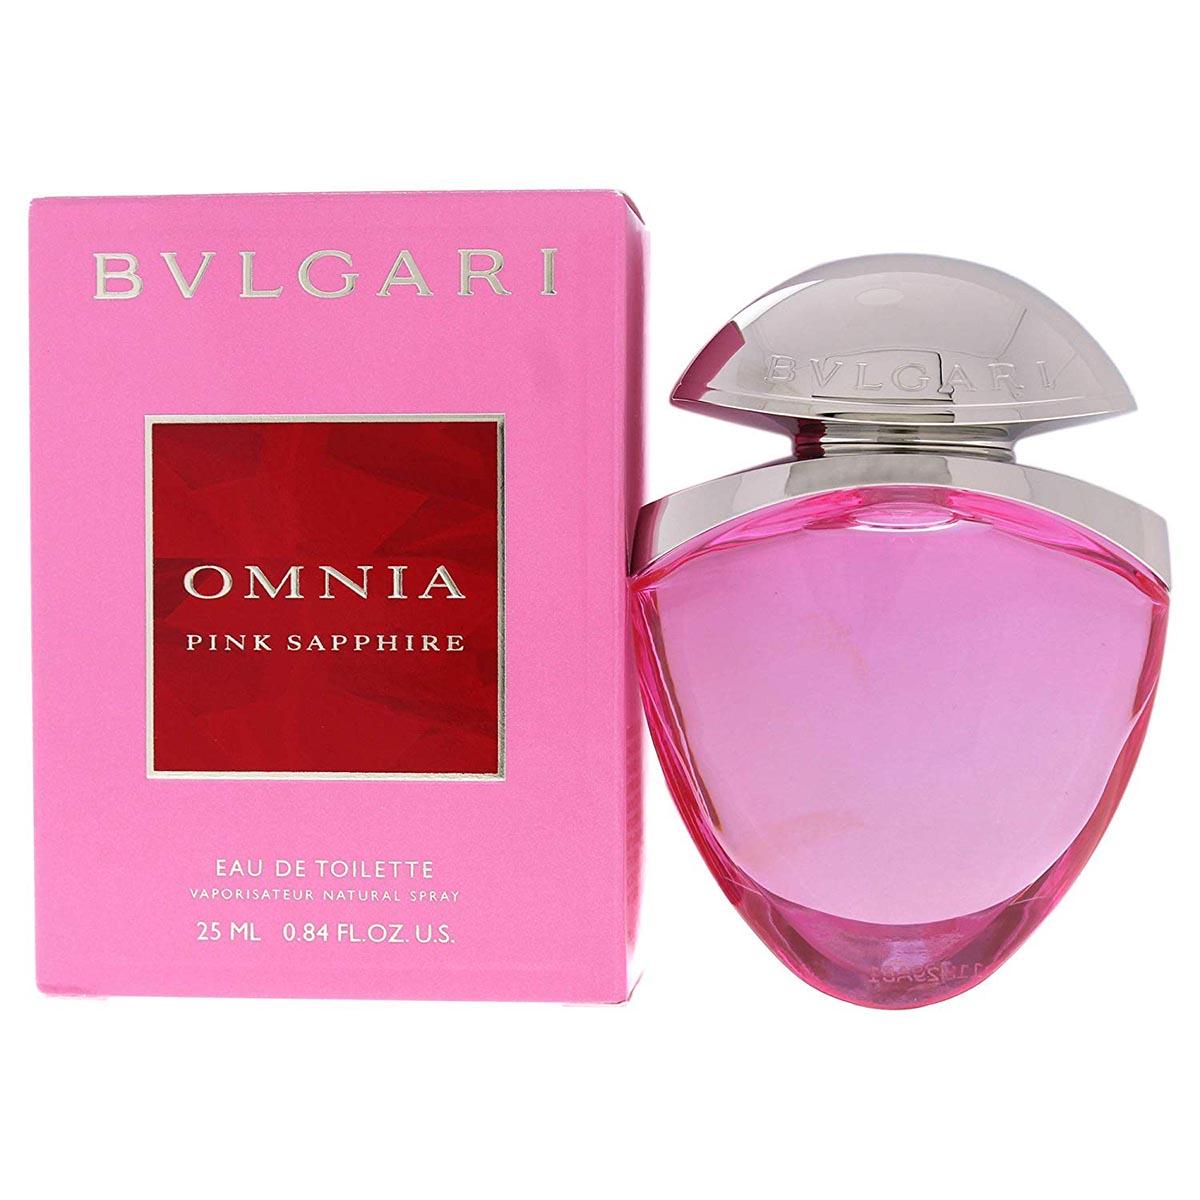 Bvlgari omnia pink sapphite eau de toilette 25ml